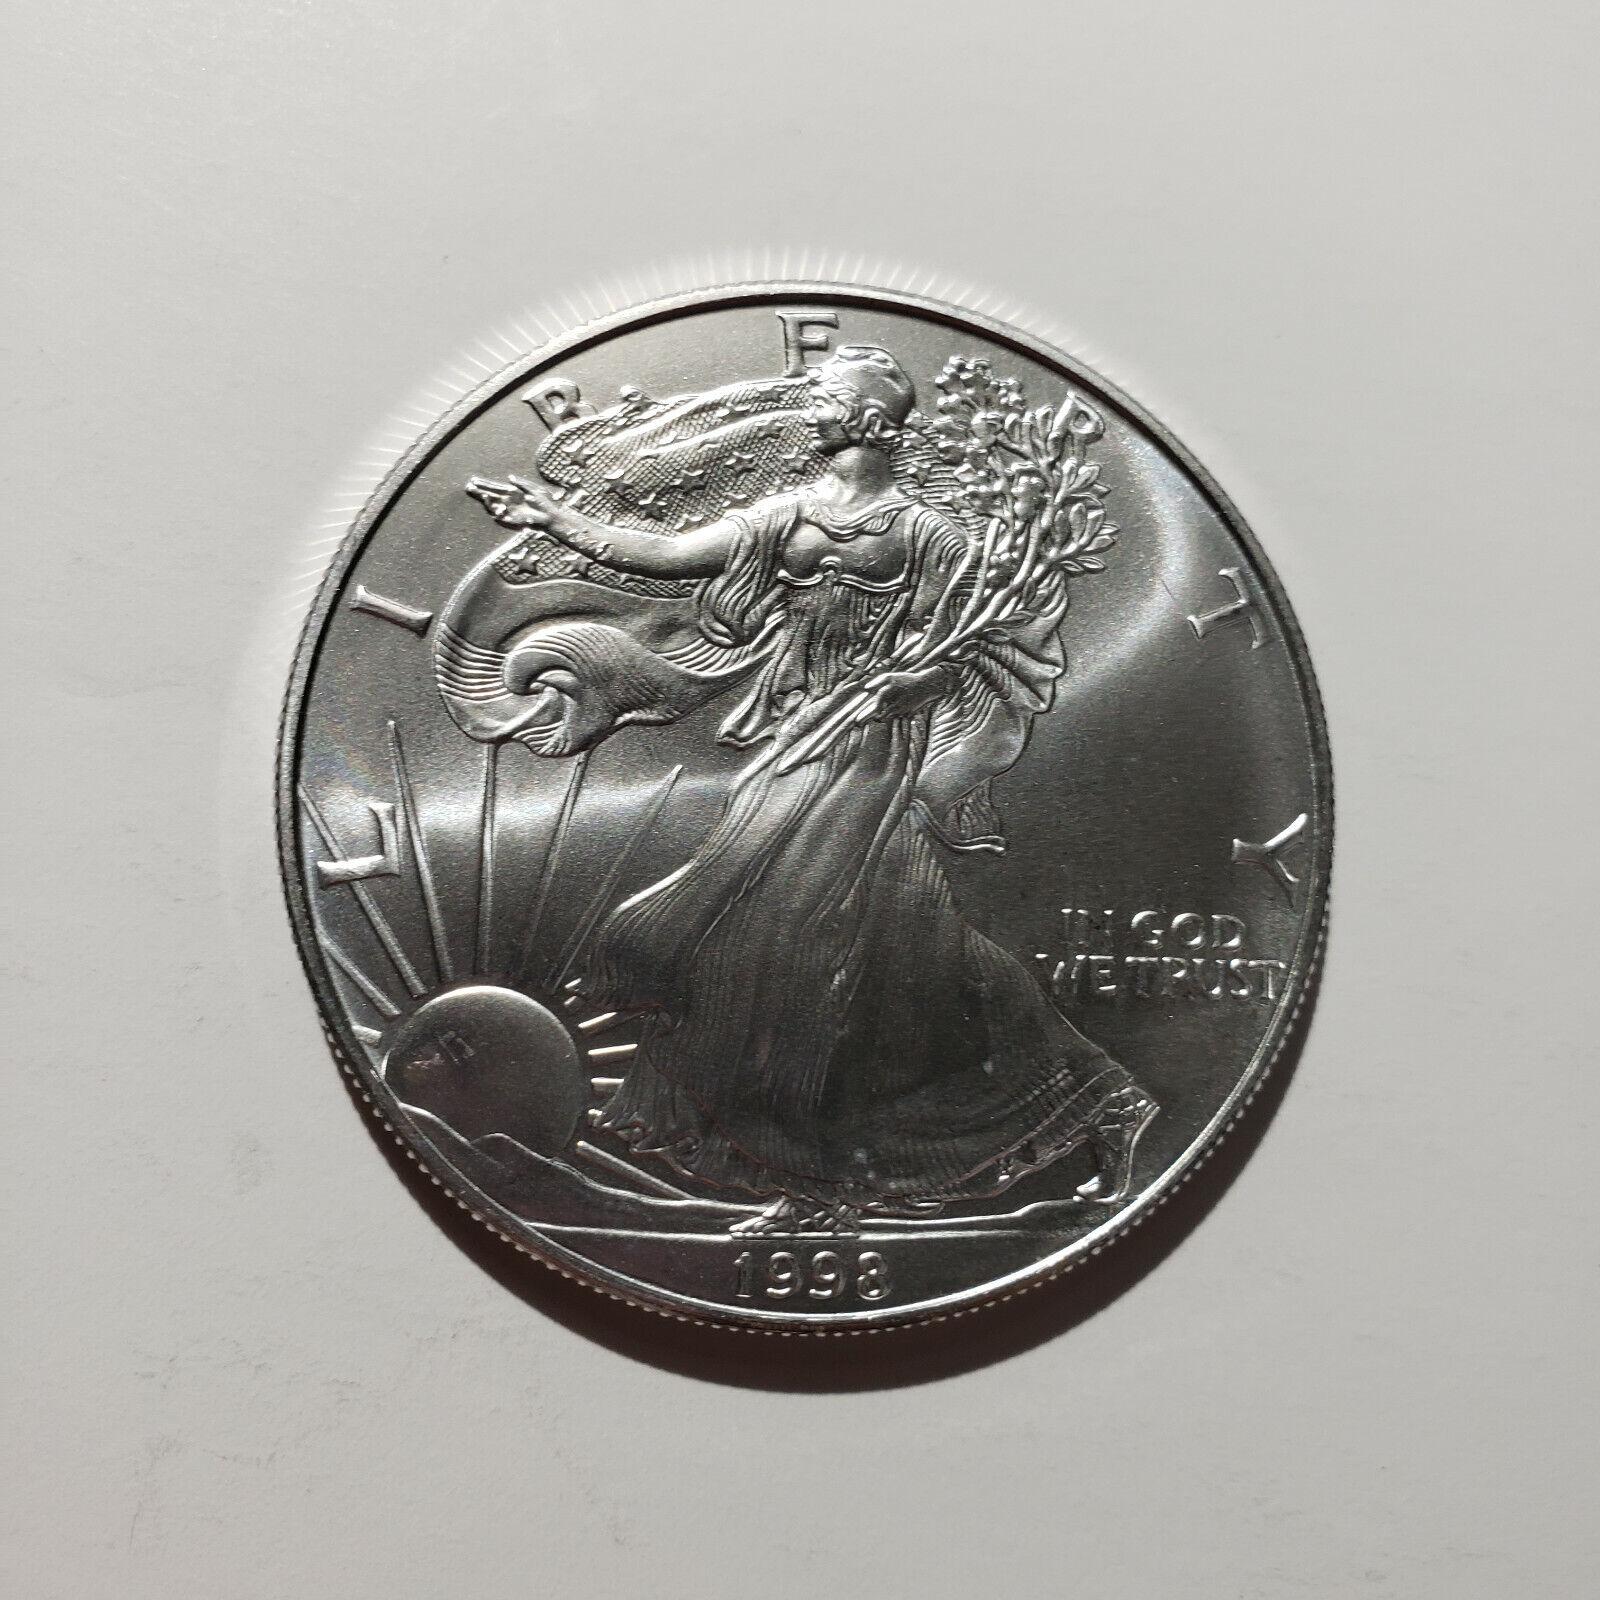 1998 American Silver Eagle 1 Oz Silver Free Shipping - $34.00